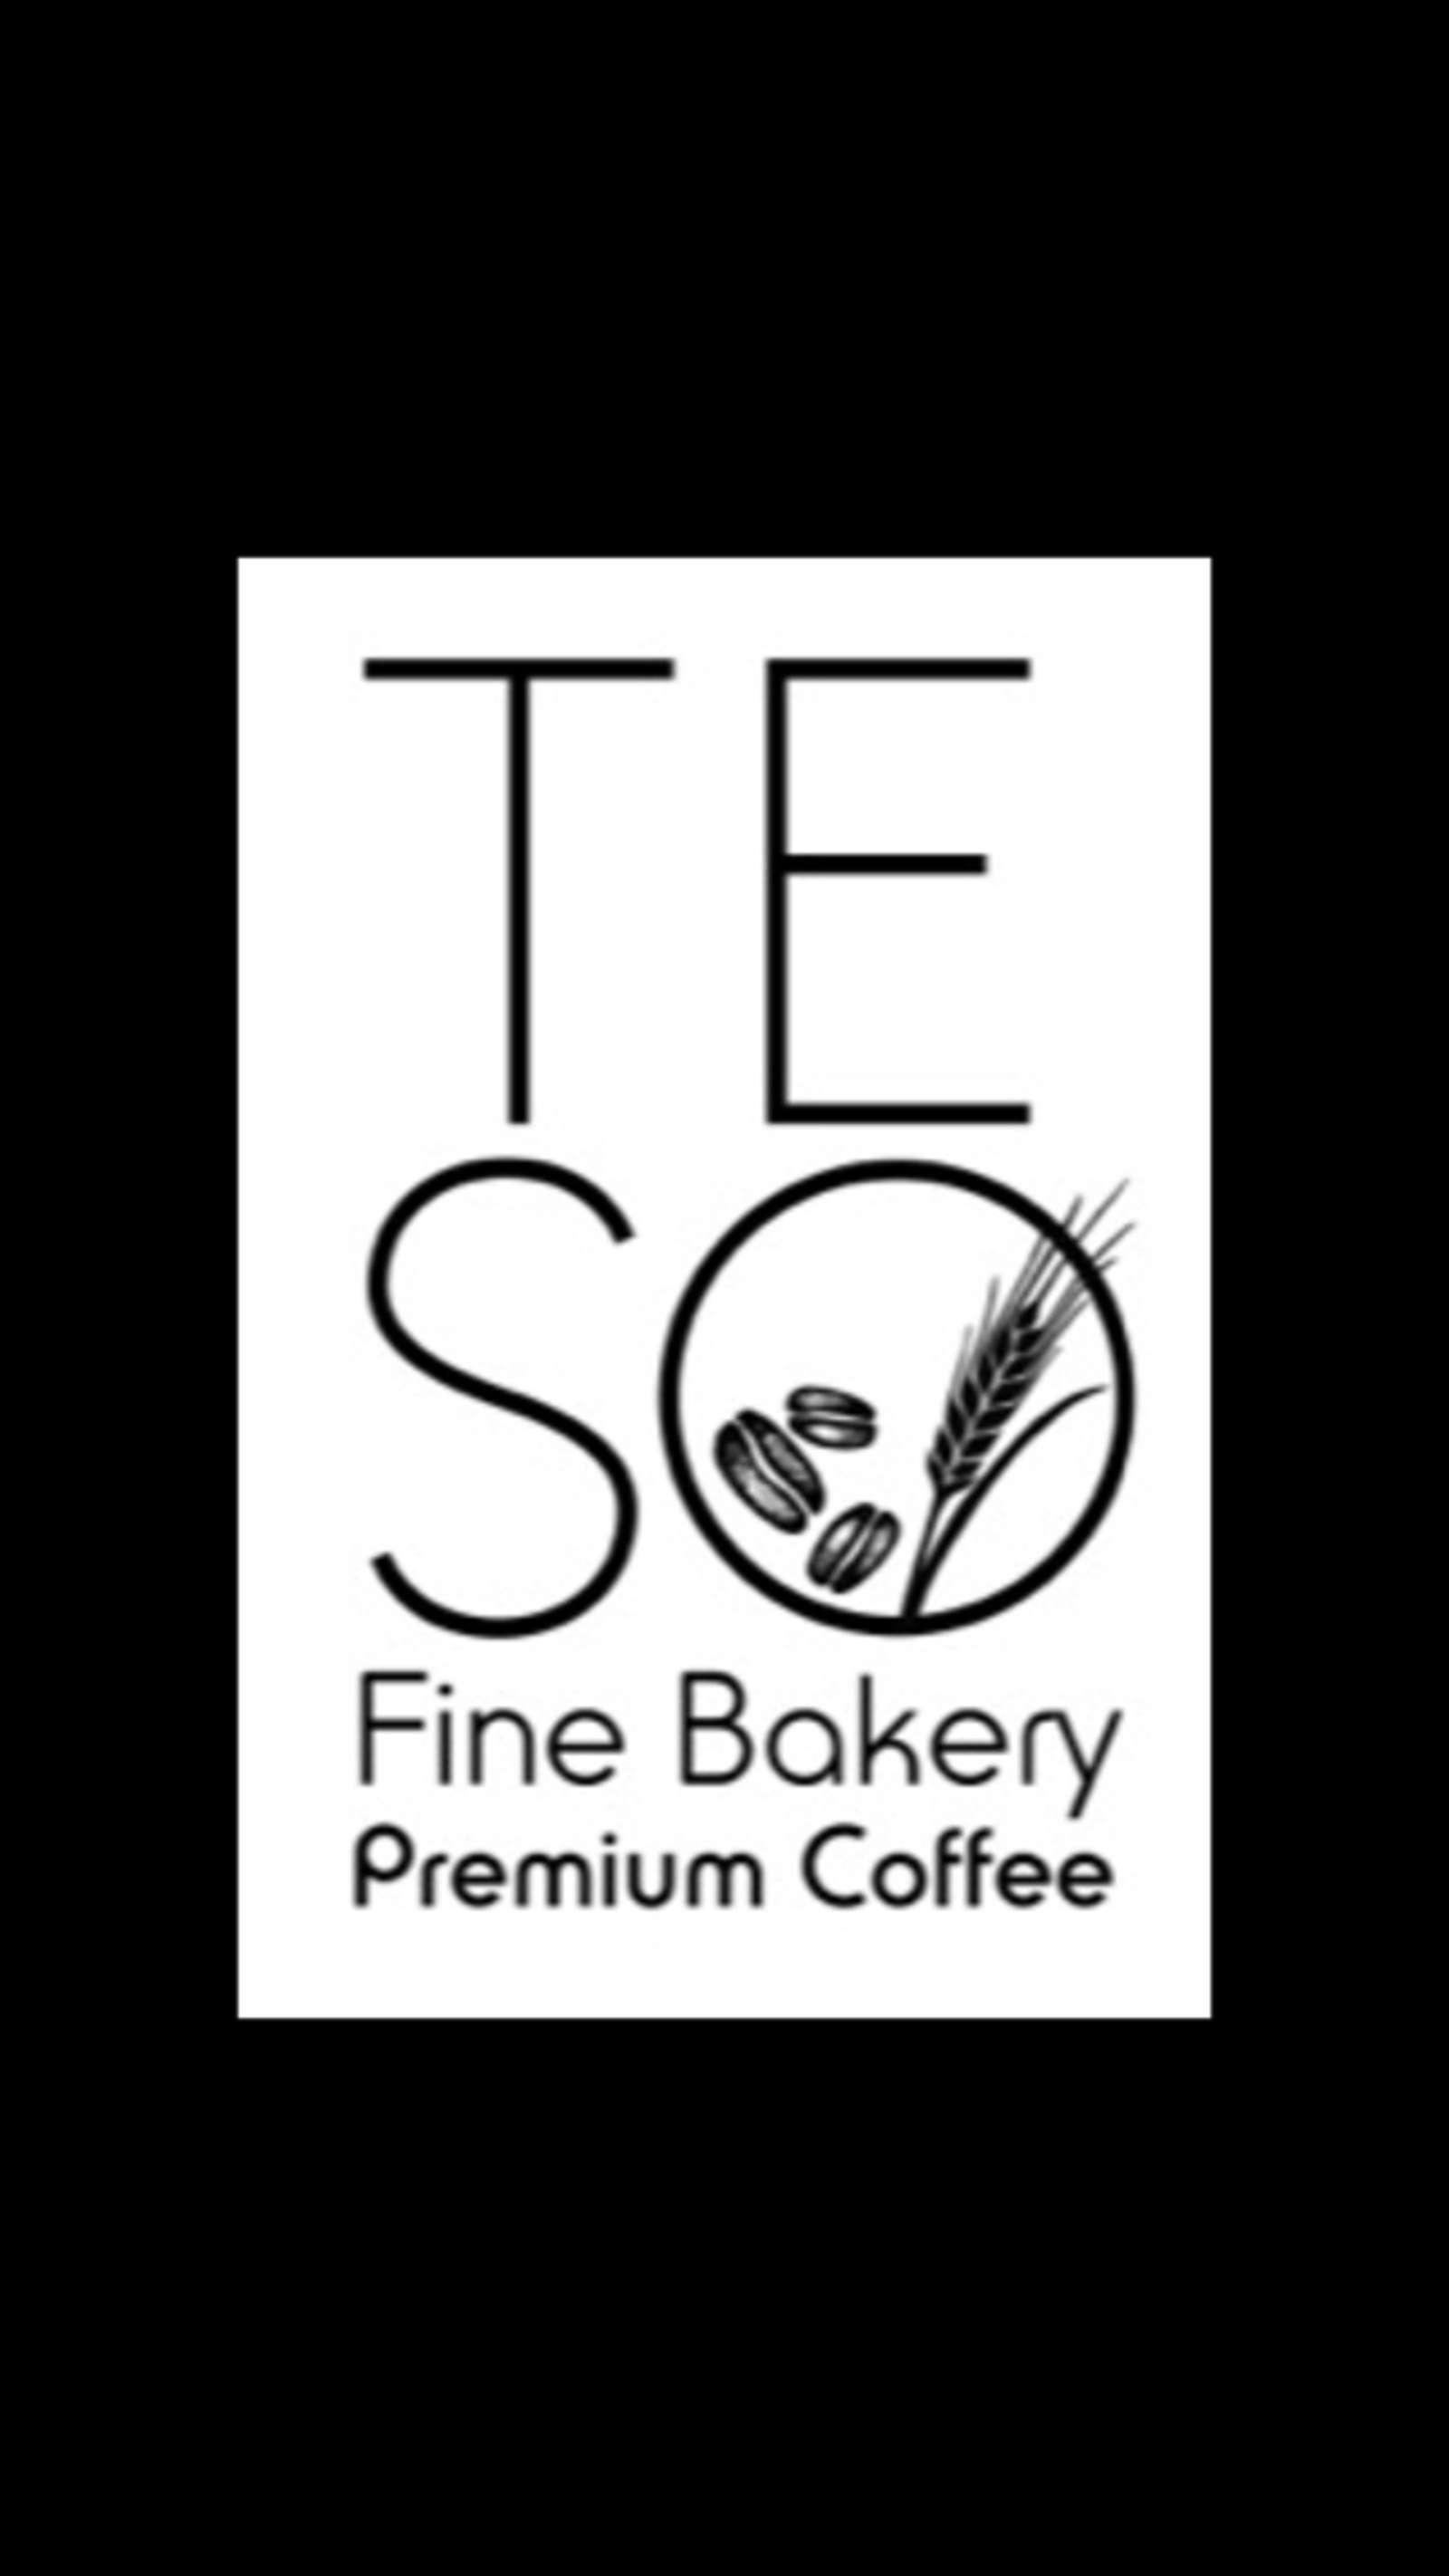 Teso Fine Bakery Premium Coffee